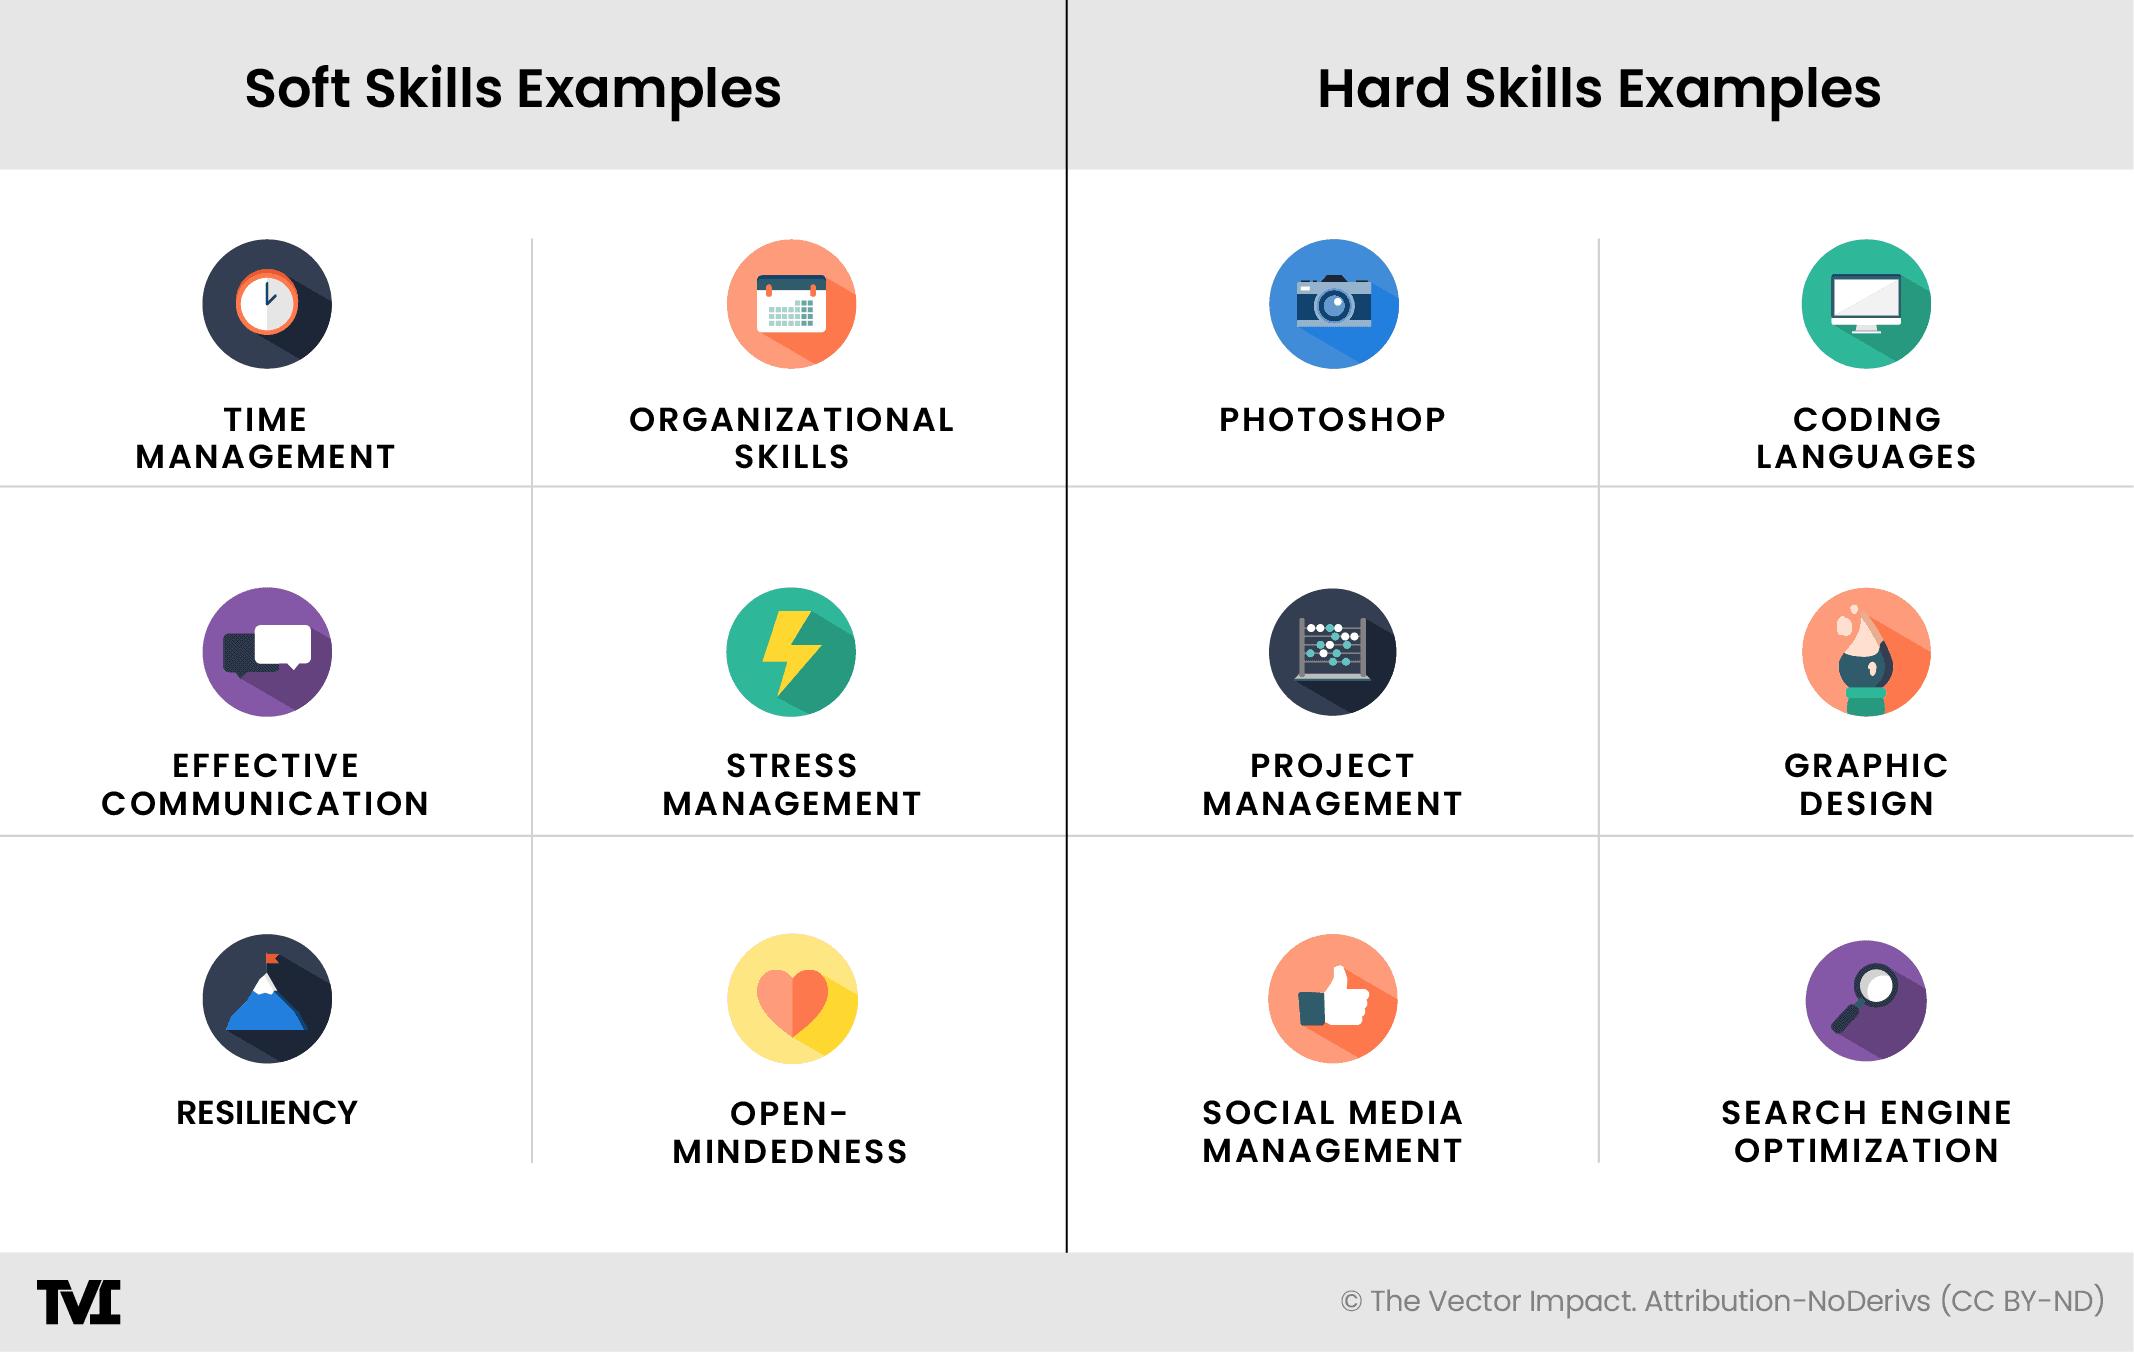 List of soft skills vs. hard skills infographic